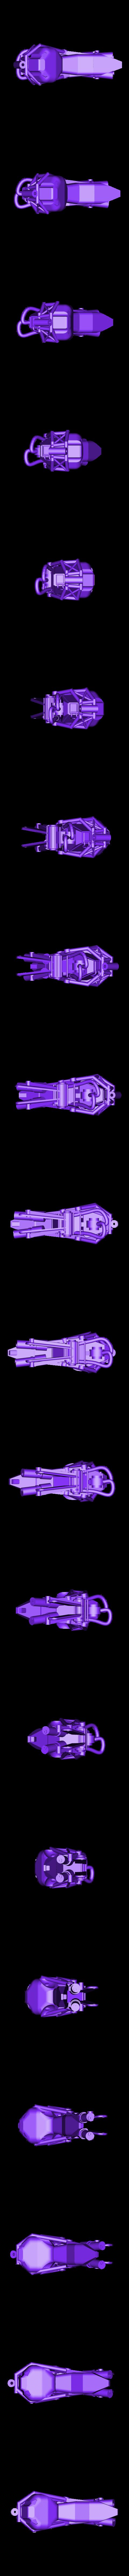 ducati body.stl Download free STL file ducati monster 696 • Object to 3D print, jasperbaudoin